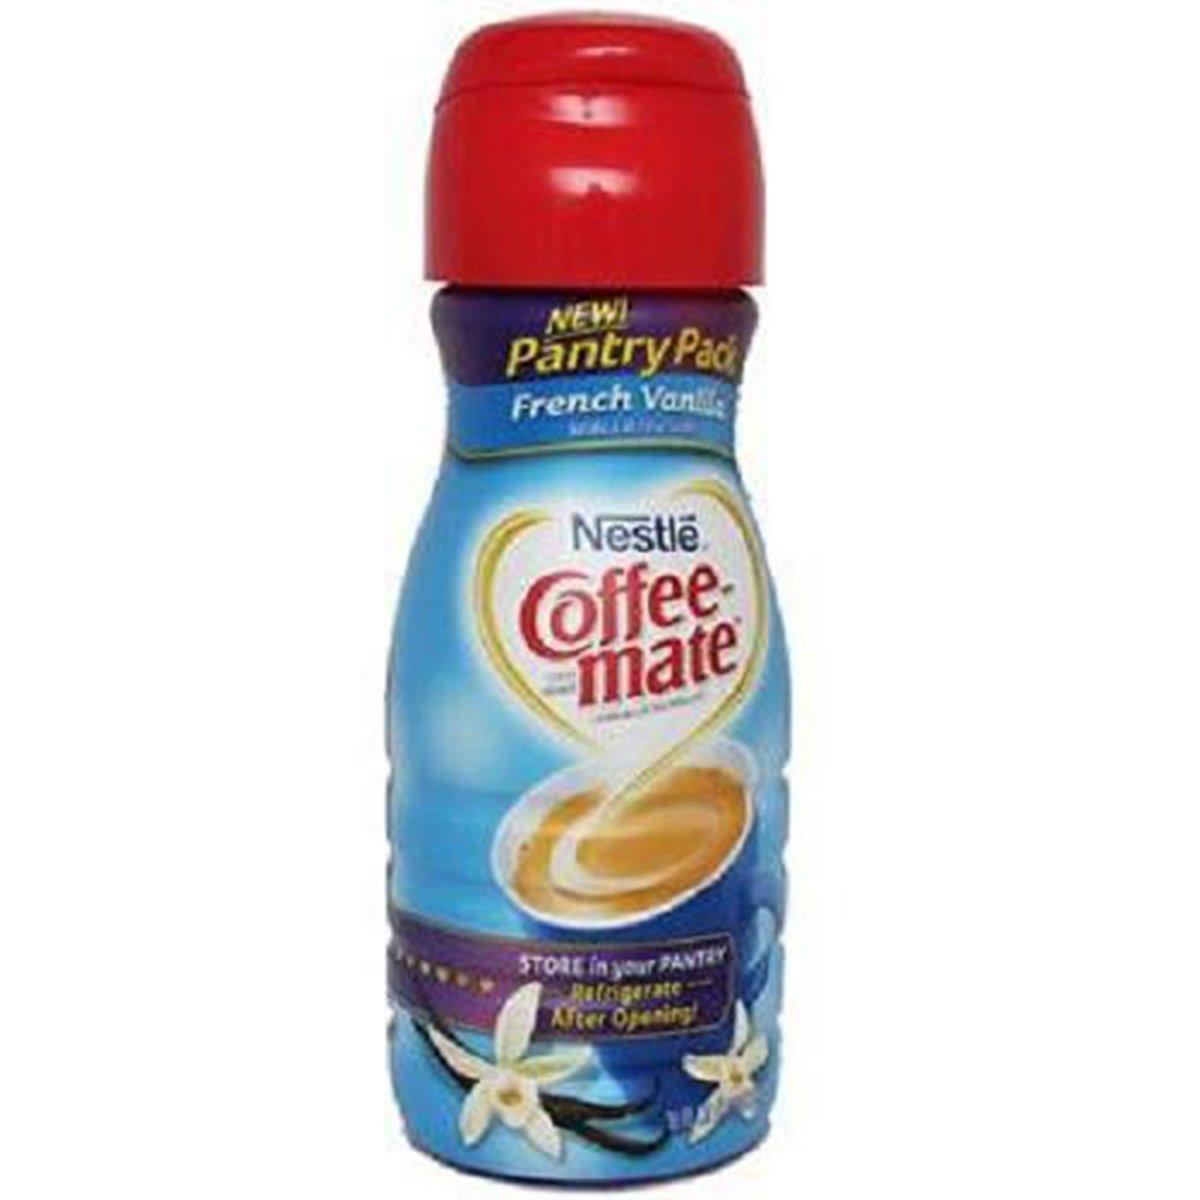 Product Of Nestle Coffee-Mate, Coffee Creamer Liquid - French Vanilla, Count 1 - Coffee Creamer / Grab Varieties & Flavors